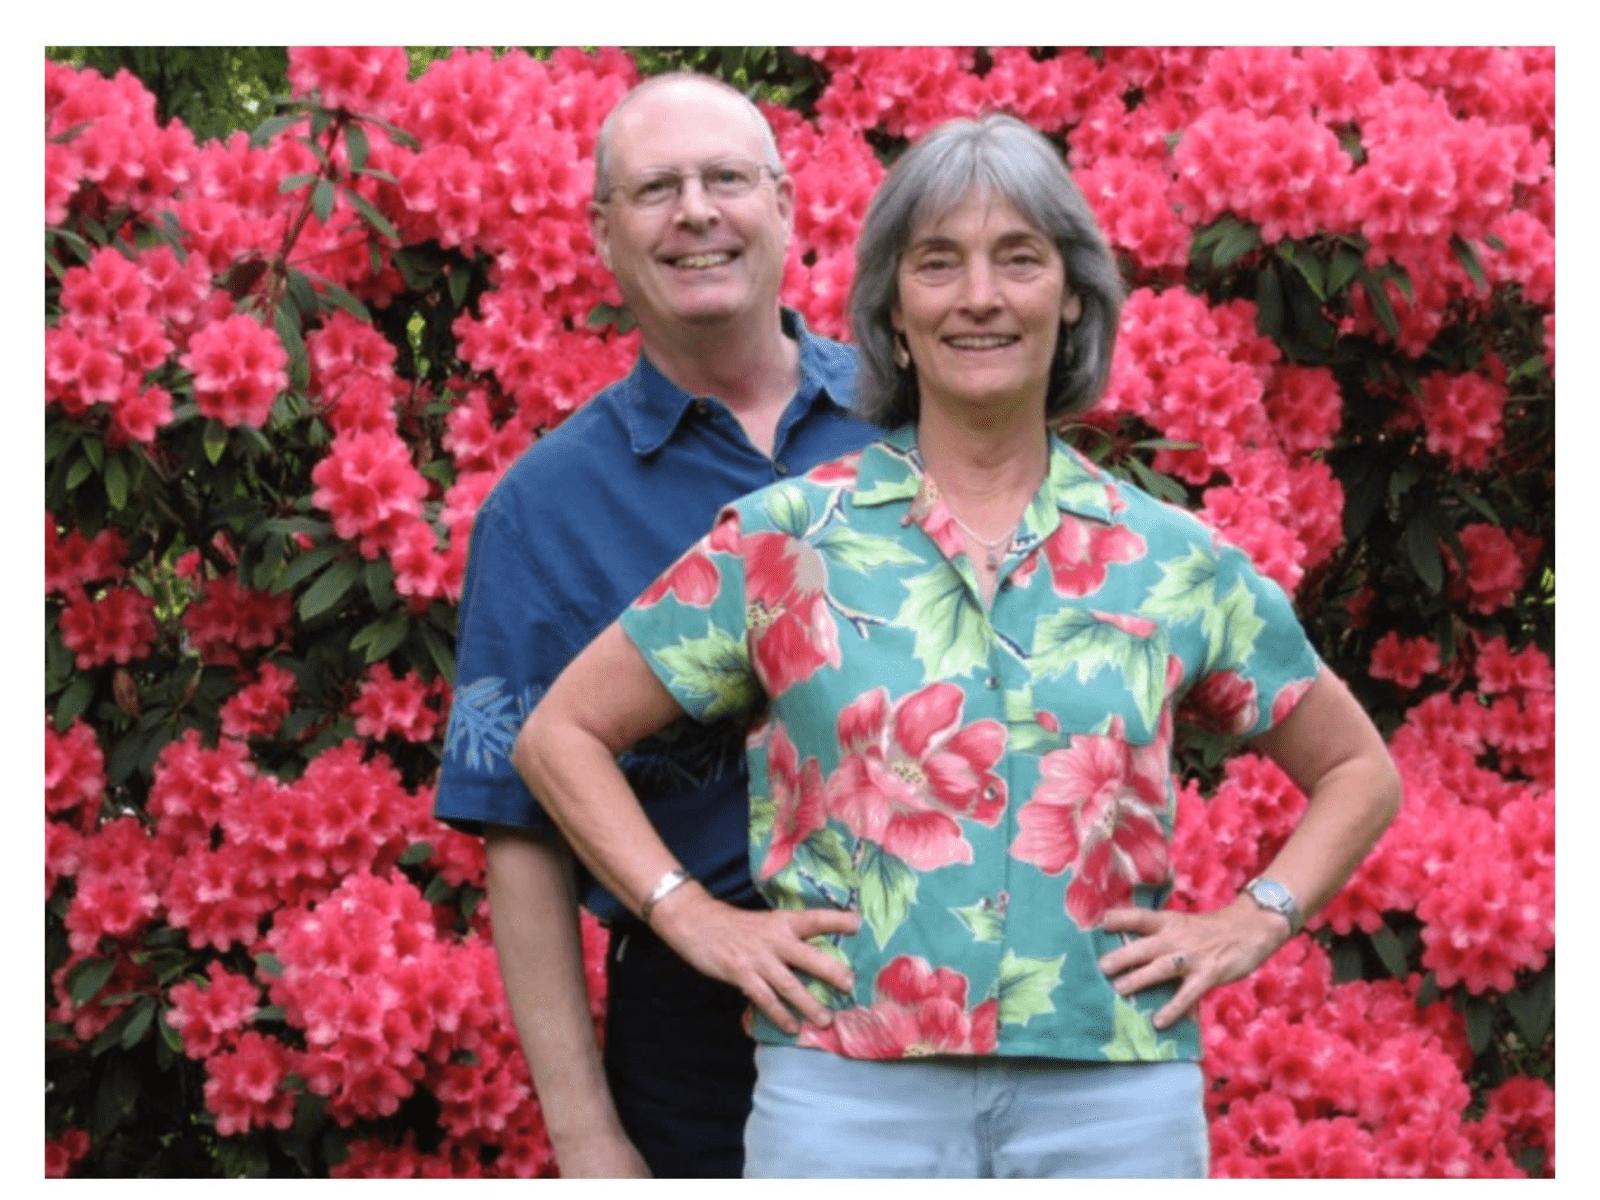 Nicola & Paul from Roberts Creek, British Columbia, Canada